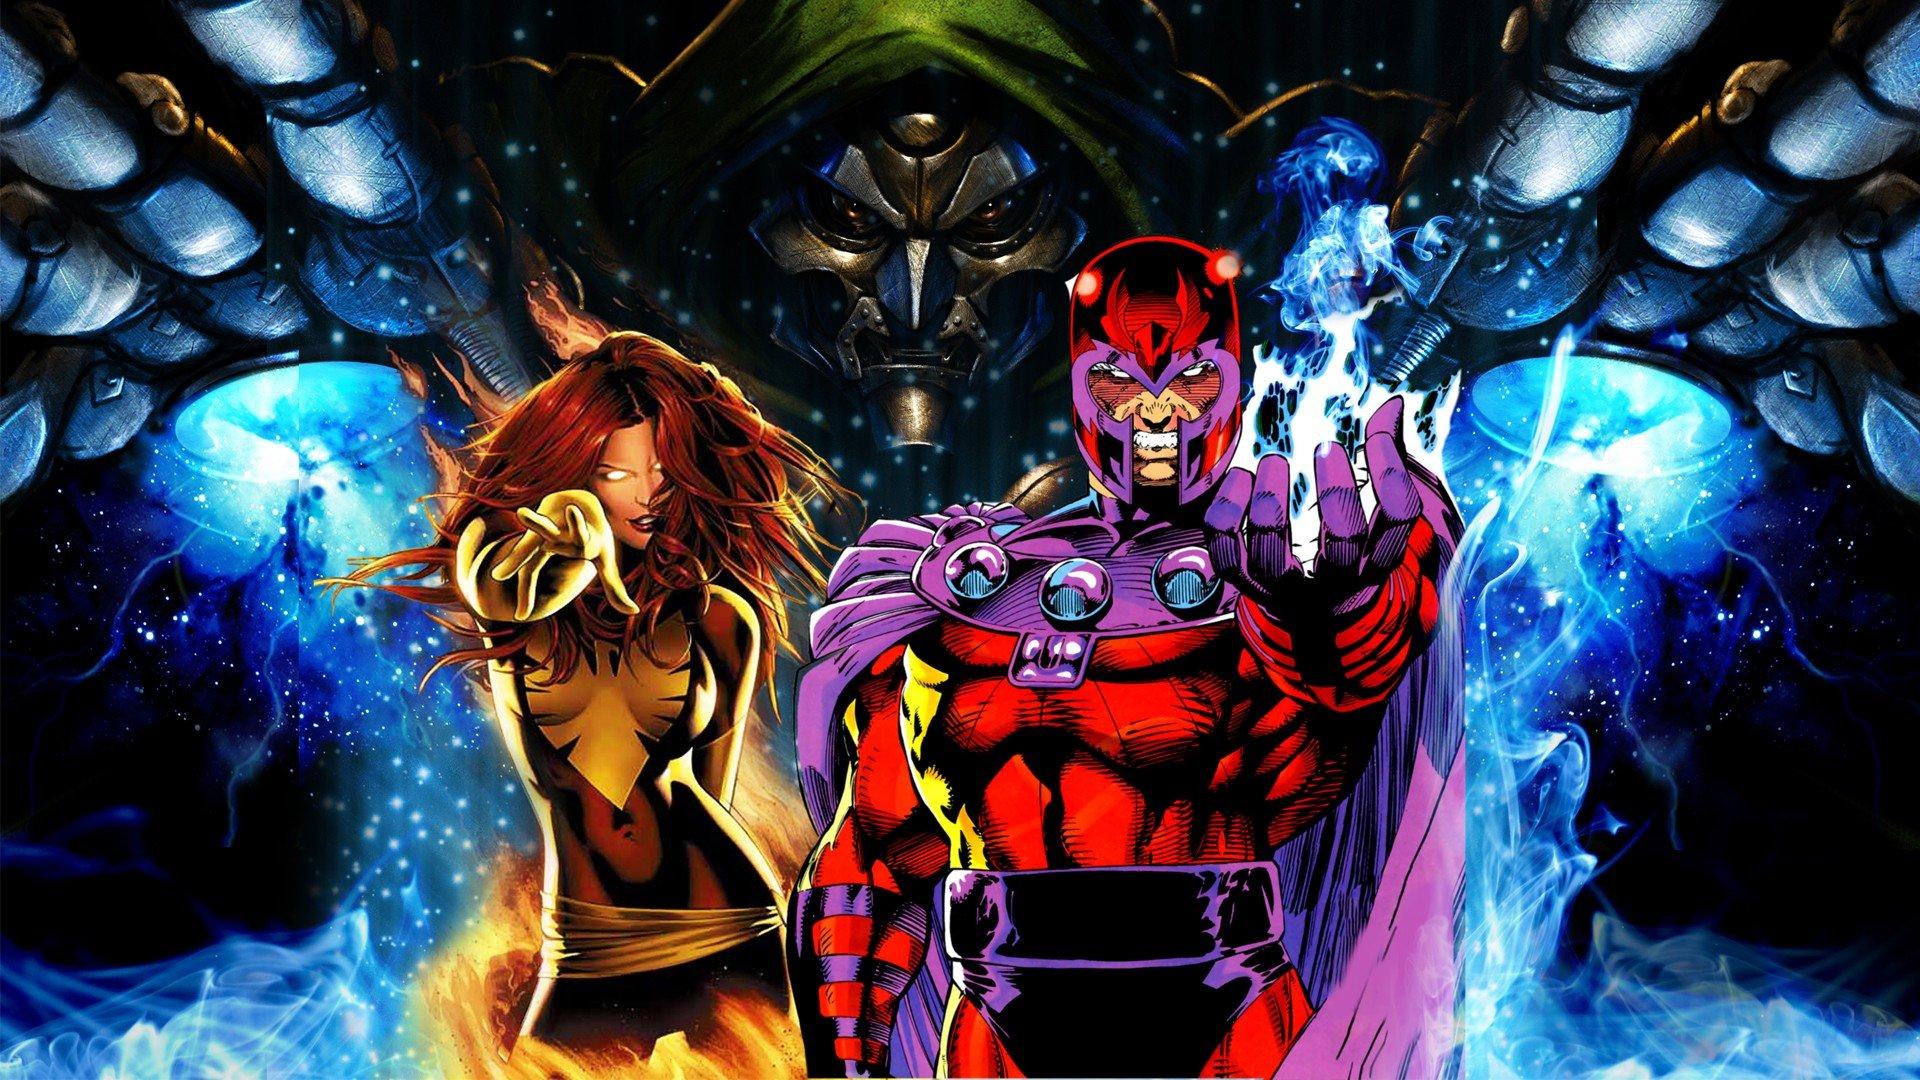 Marvel Magneto Wallpaper - WallpaperSafari X Men First Class Magneto And Mystique